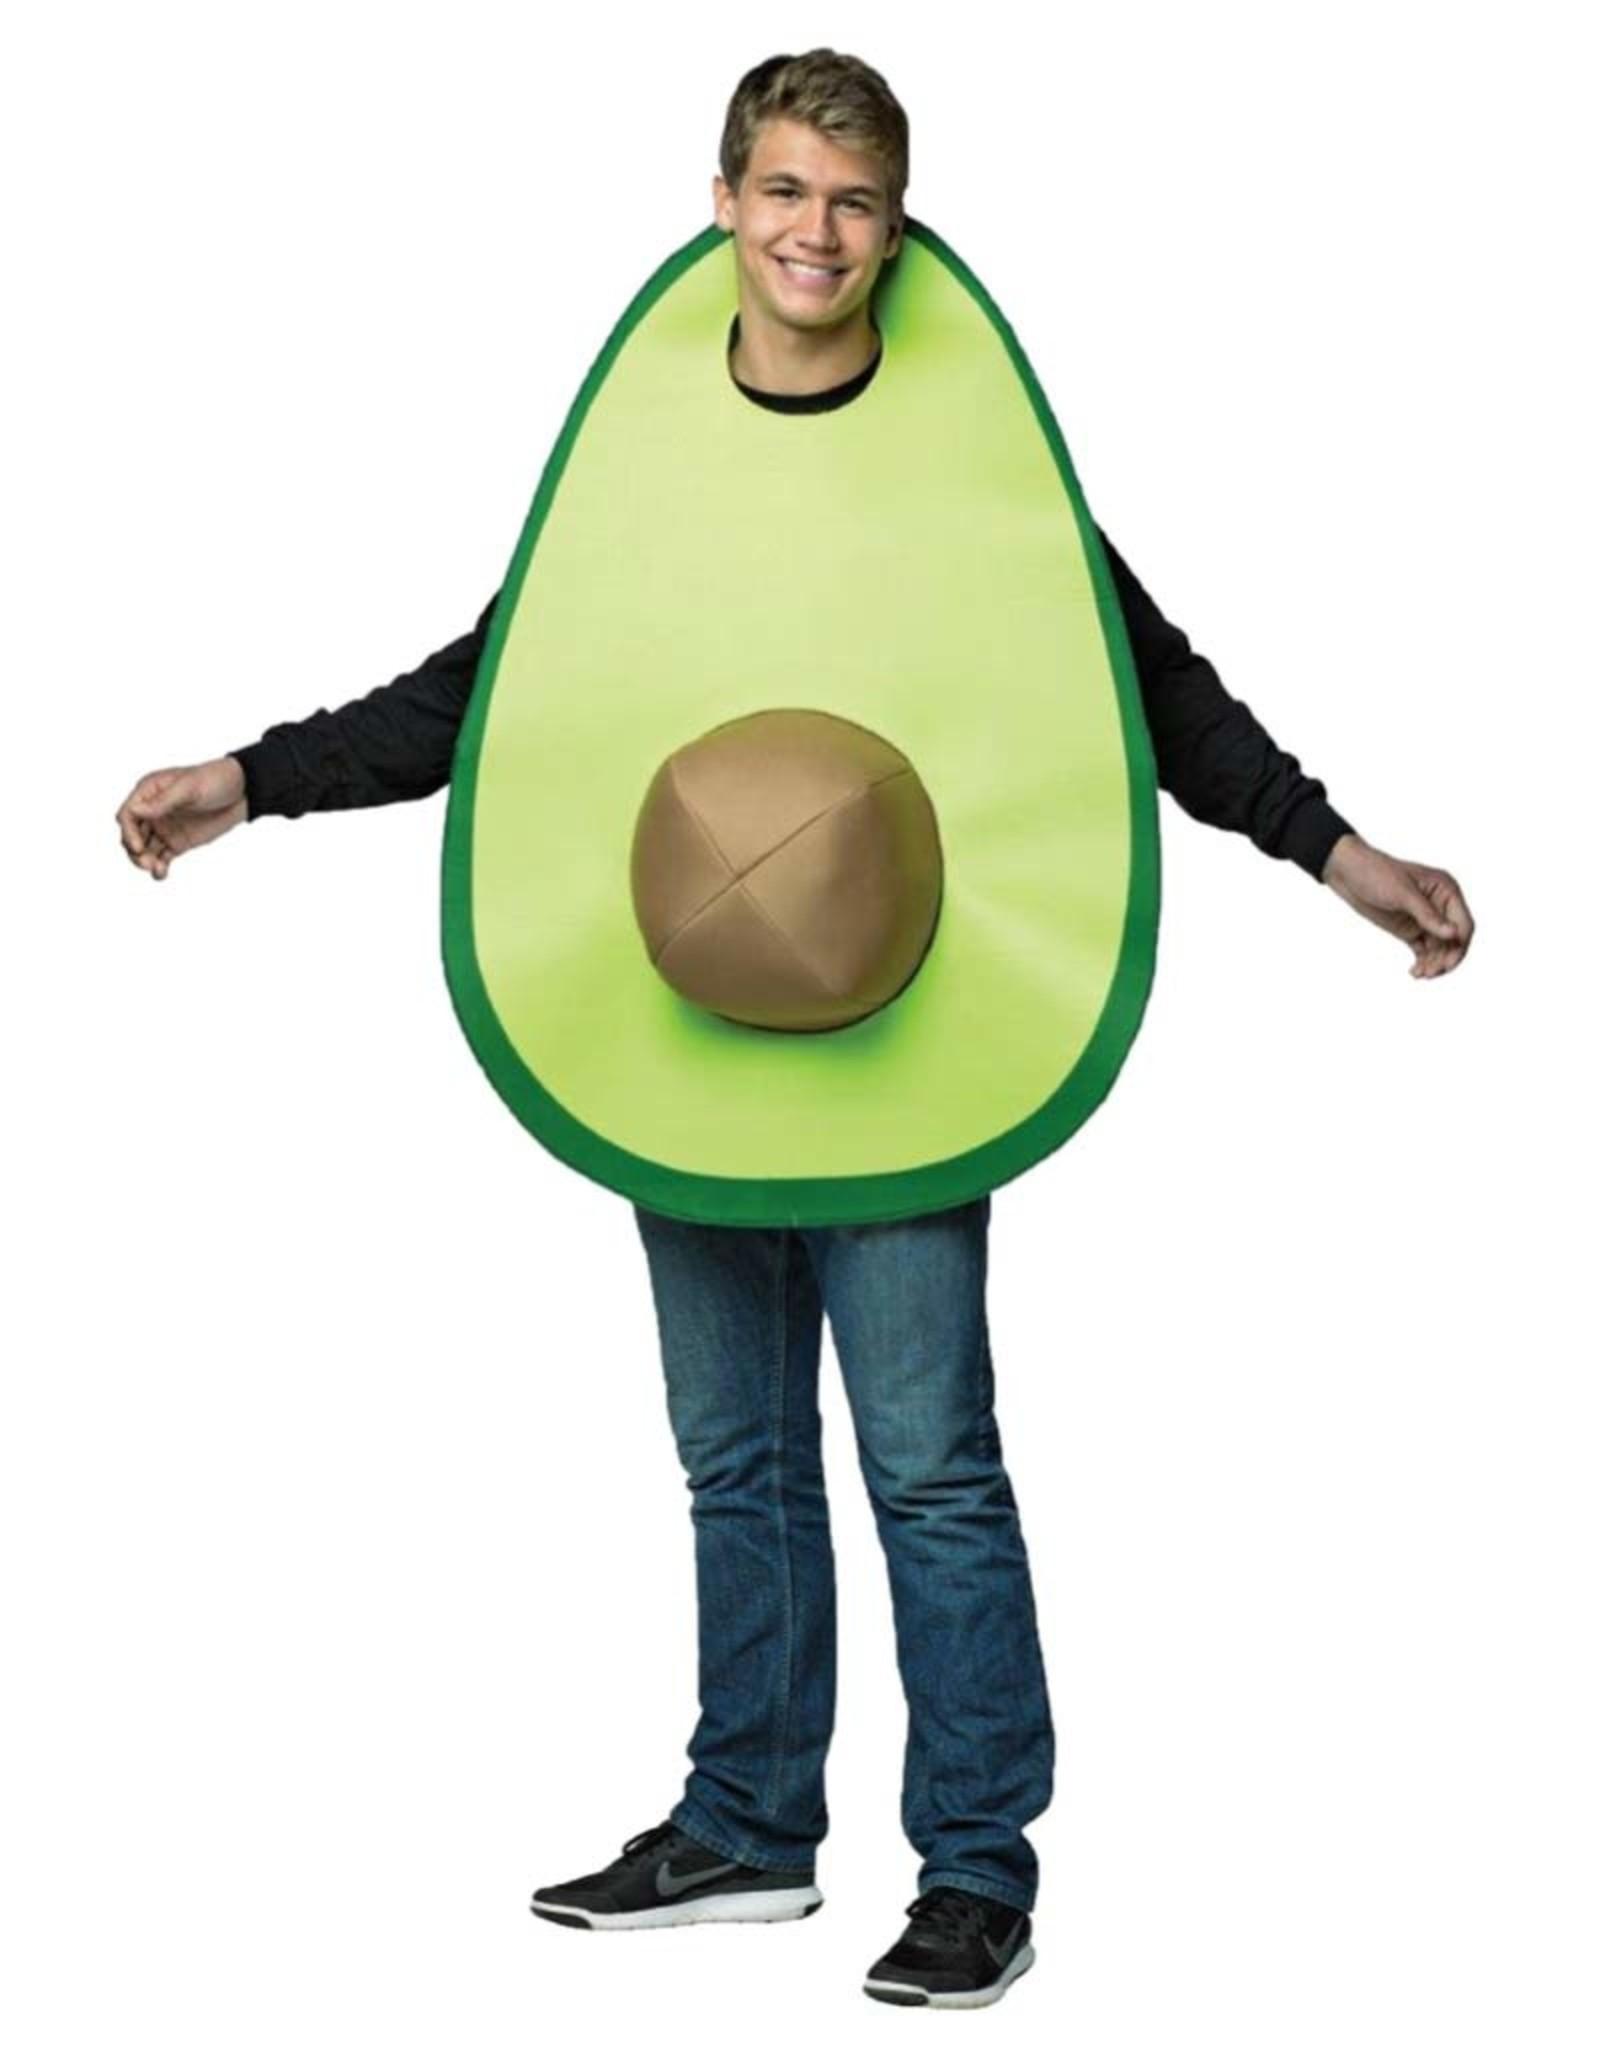 Avocado - Humor